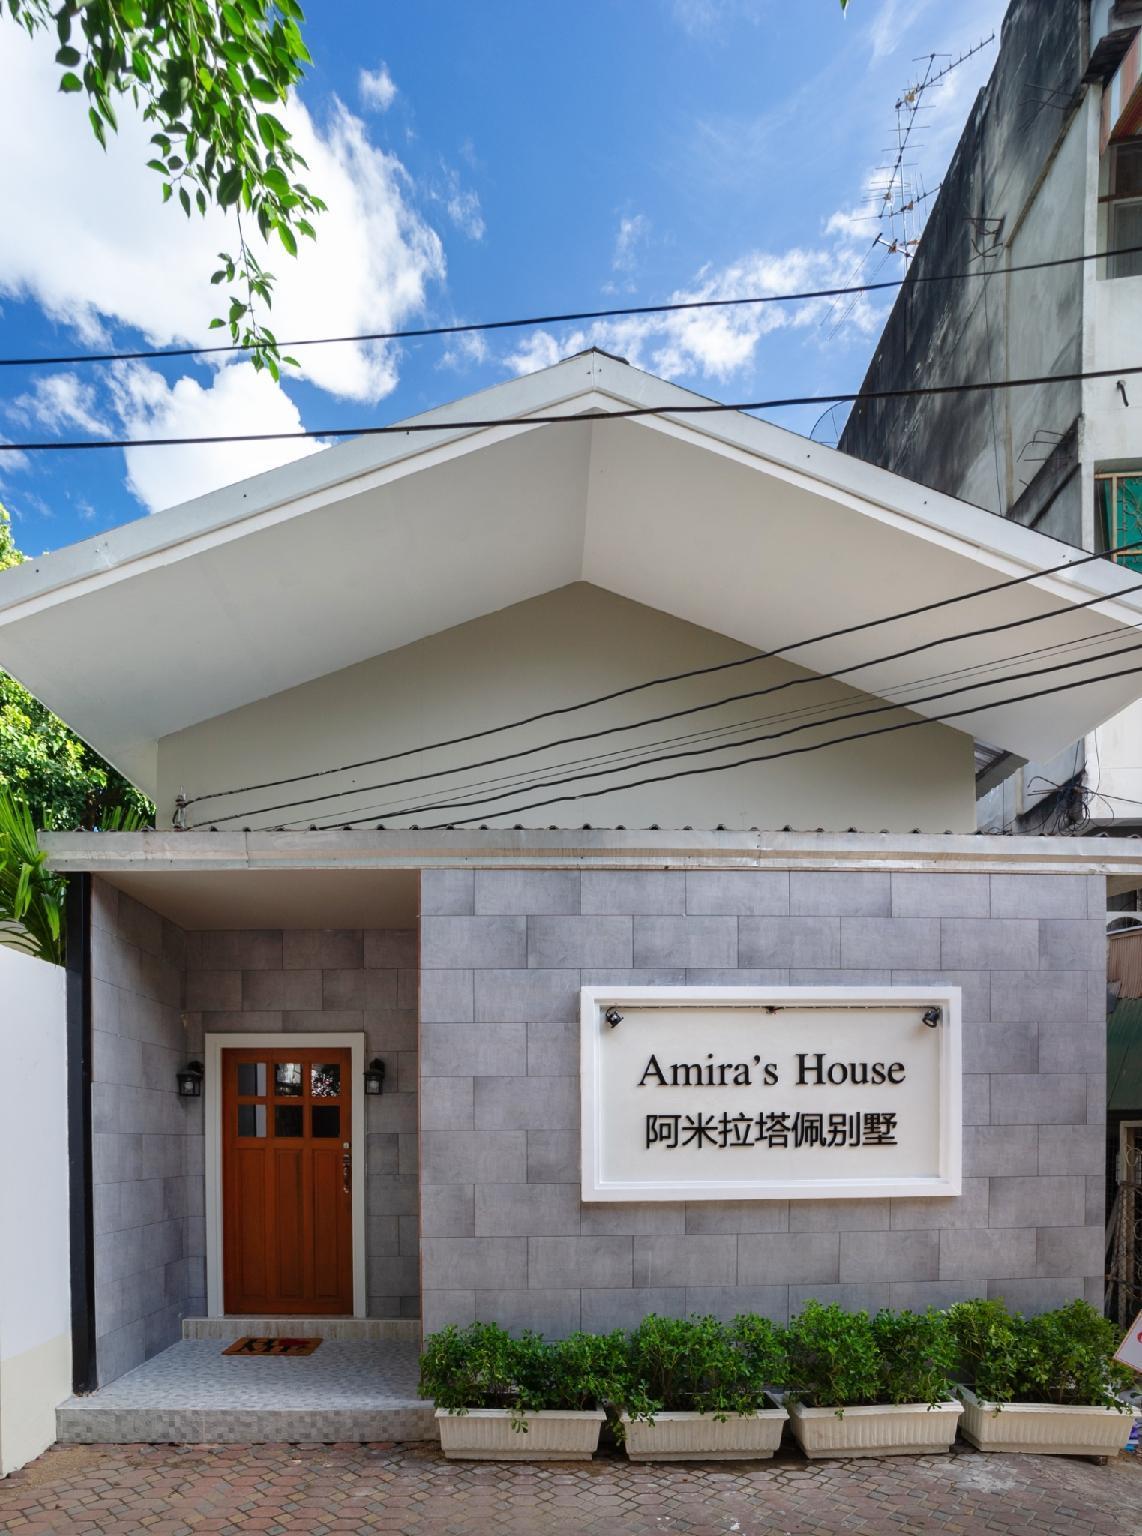 Amira's House